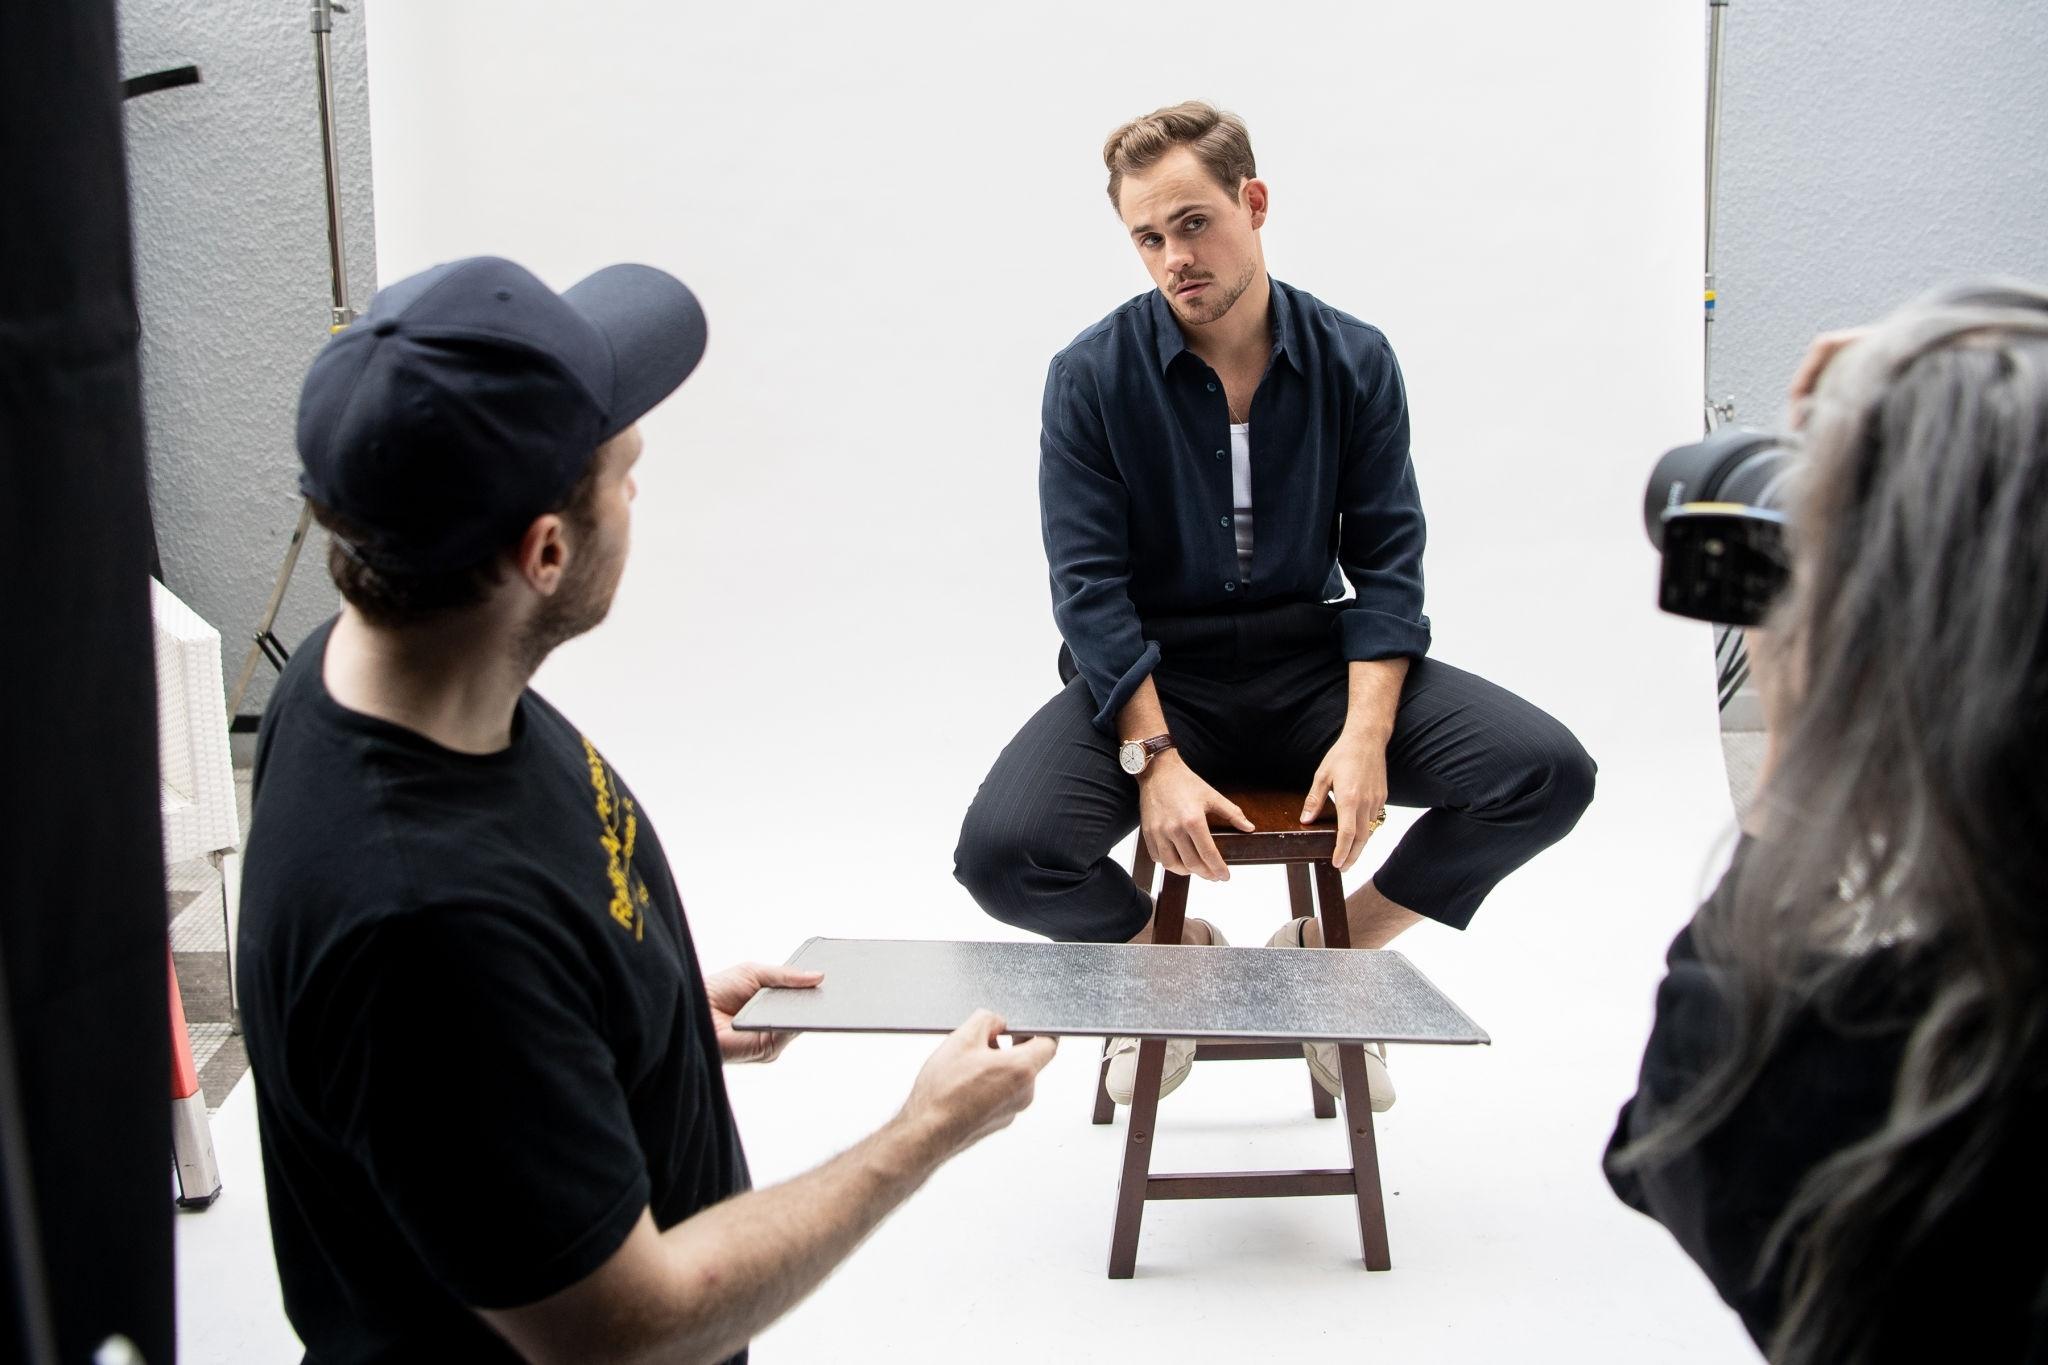 Dacre Montgomery - Entertainment Weekly Photoshoot - 2019